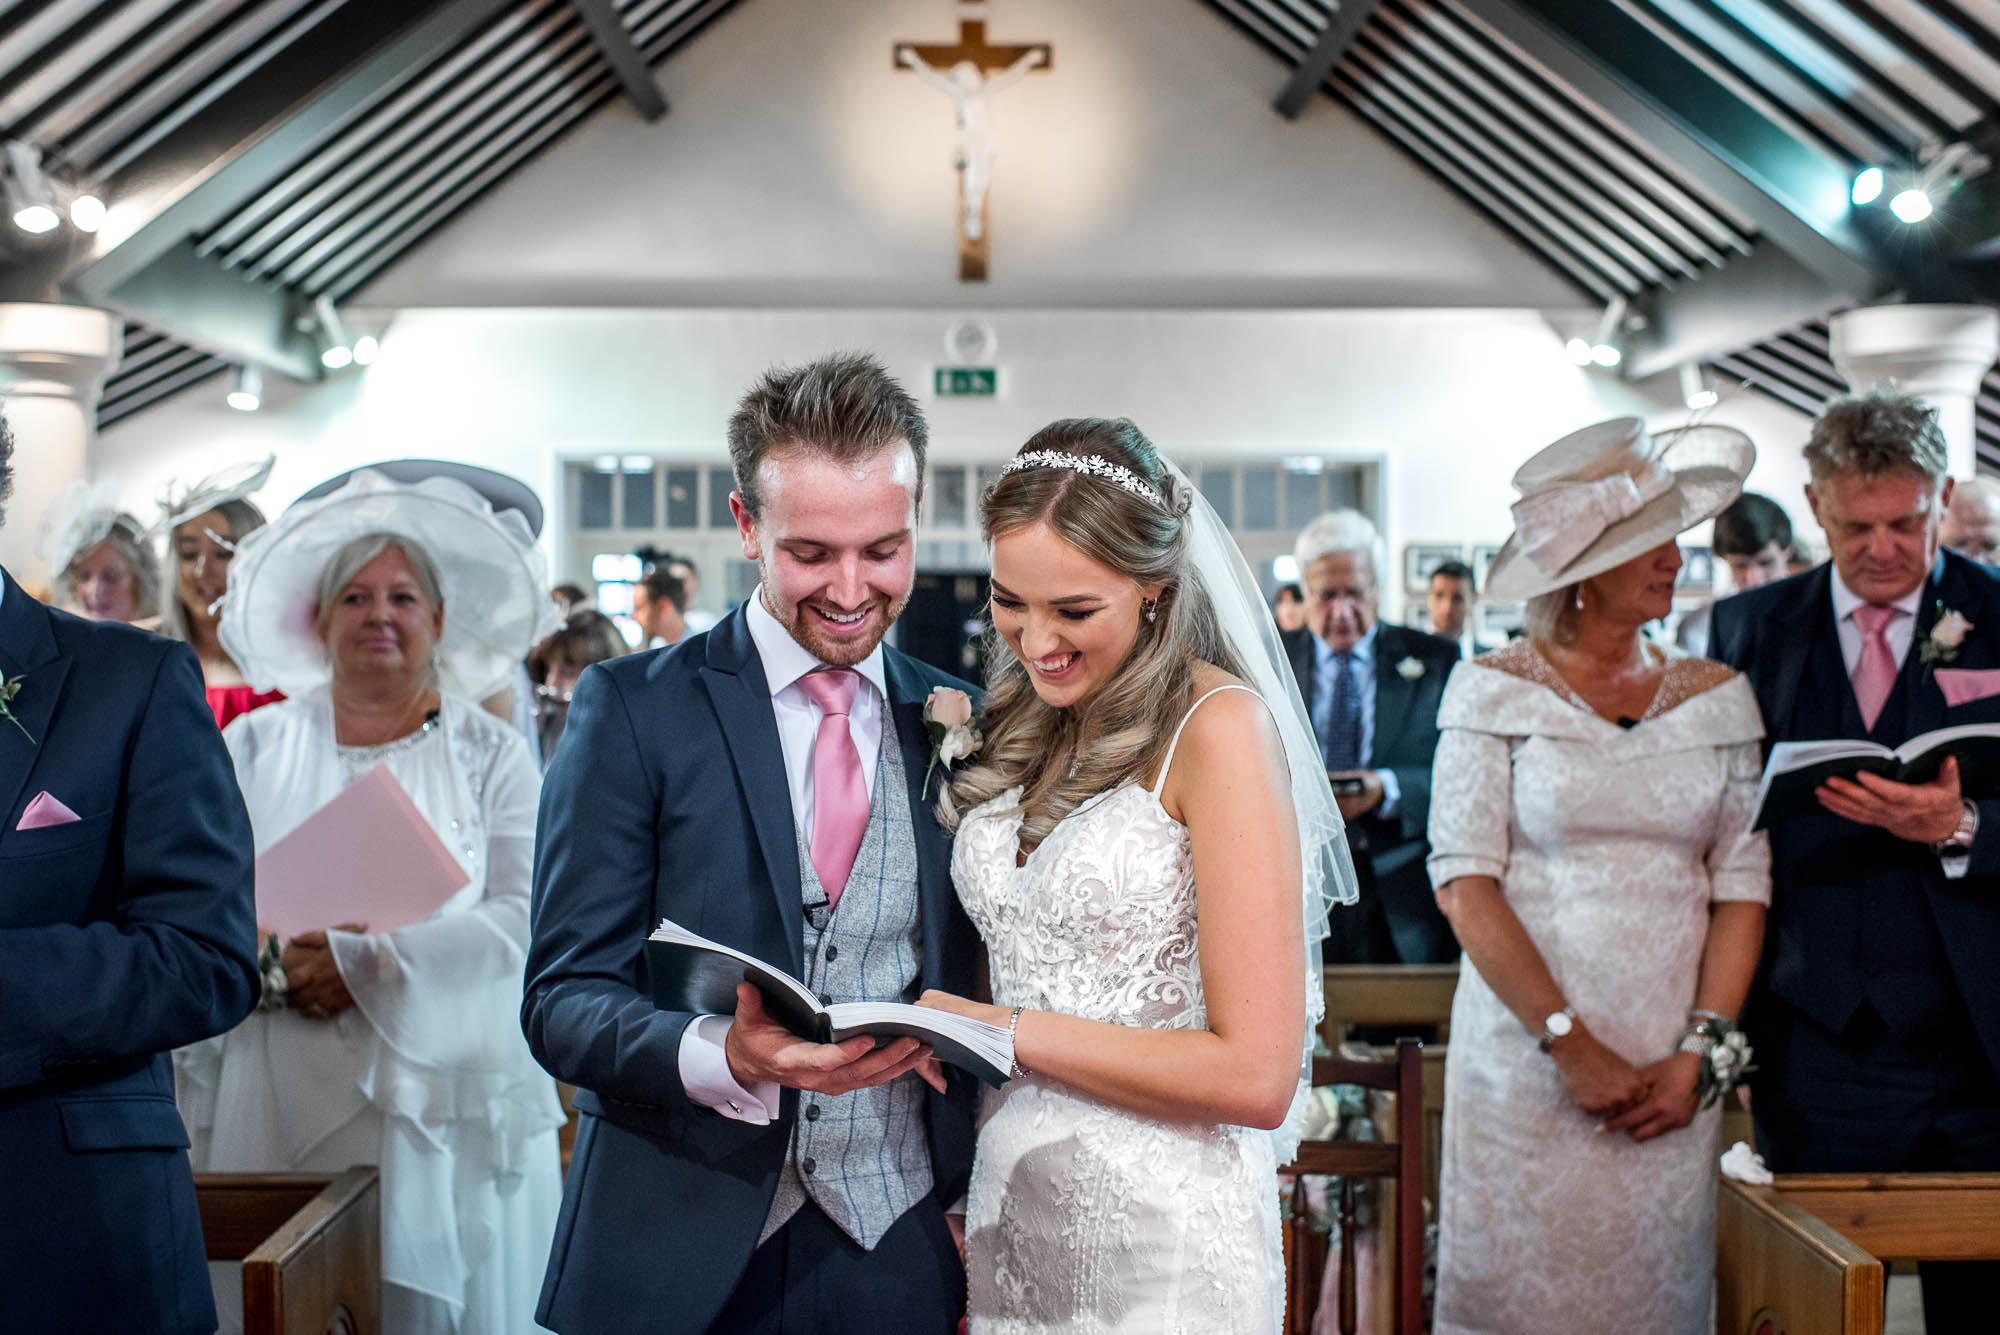 Peckforton Castle Wedding Adam Lowndes Photography Staffordshire Wedding Photography